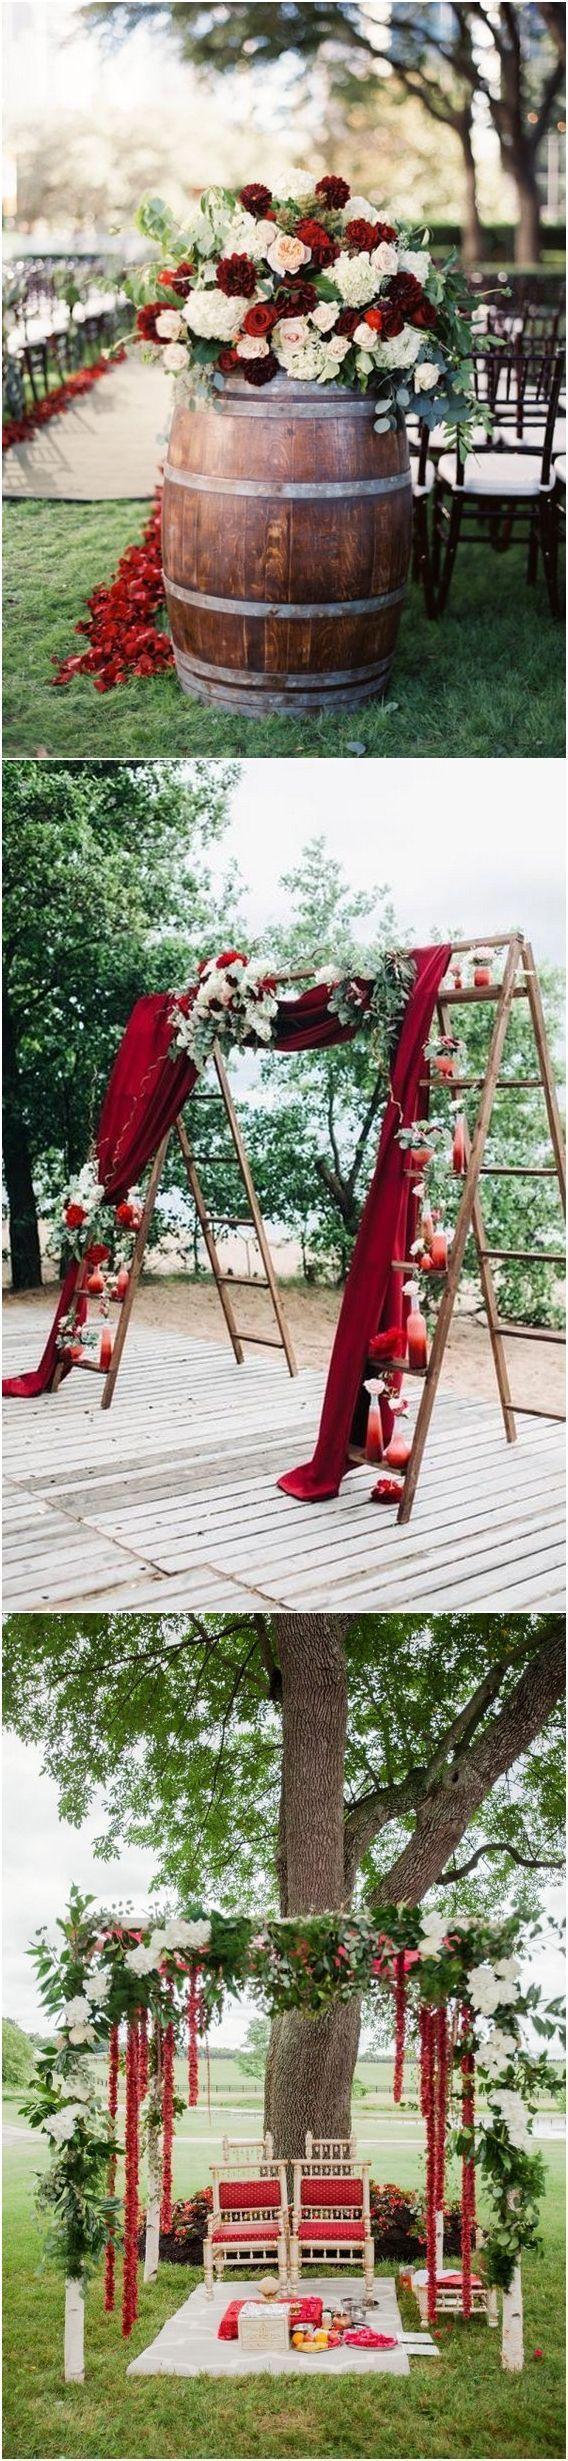 Outdoor fall wedding decor  Wedding Decorations   Decoration Weddings and Wedding